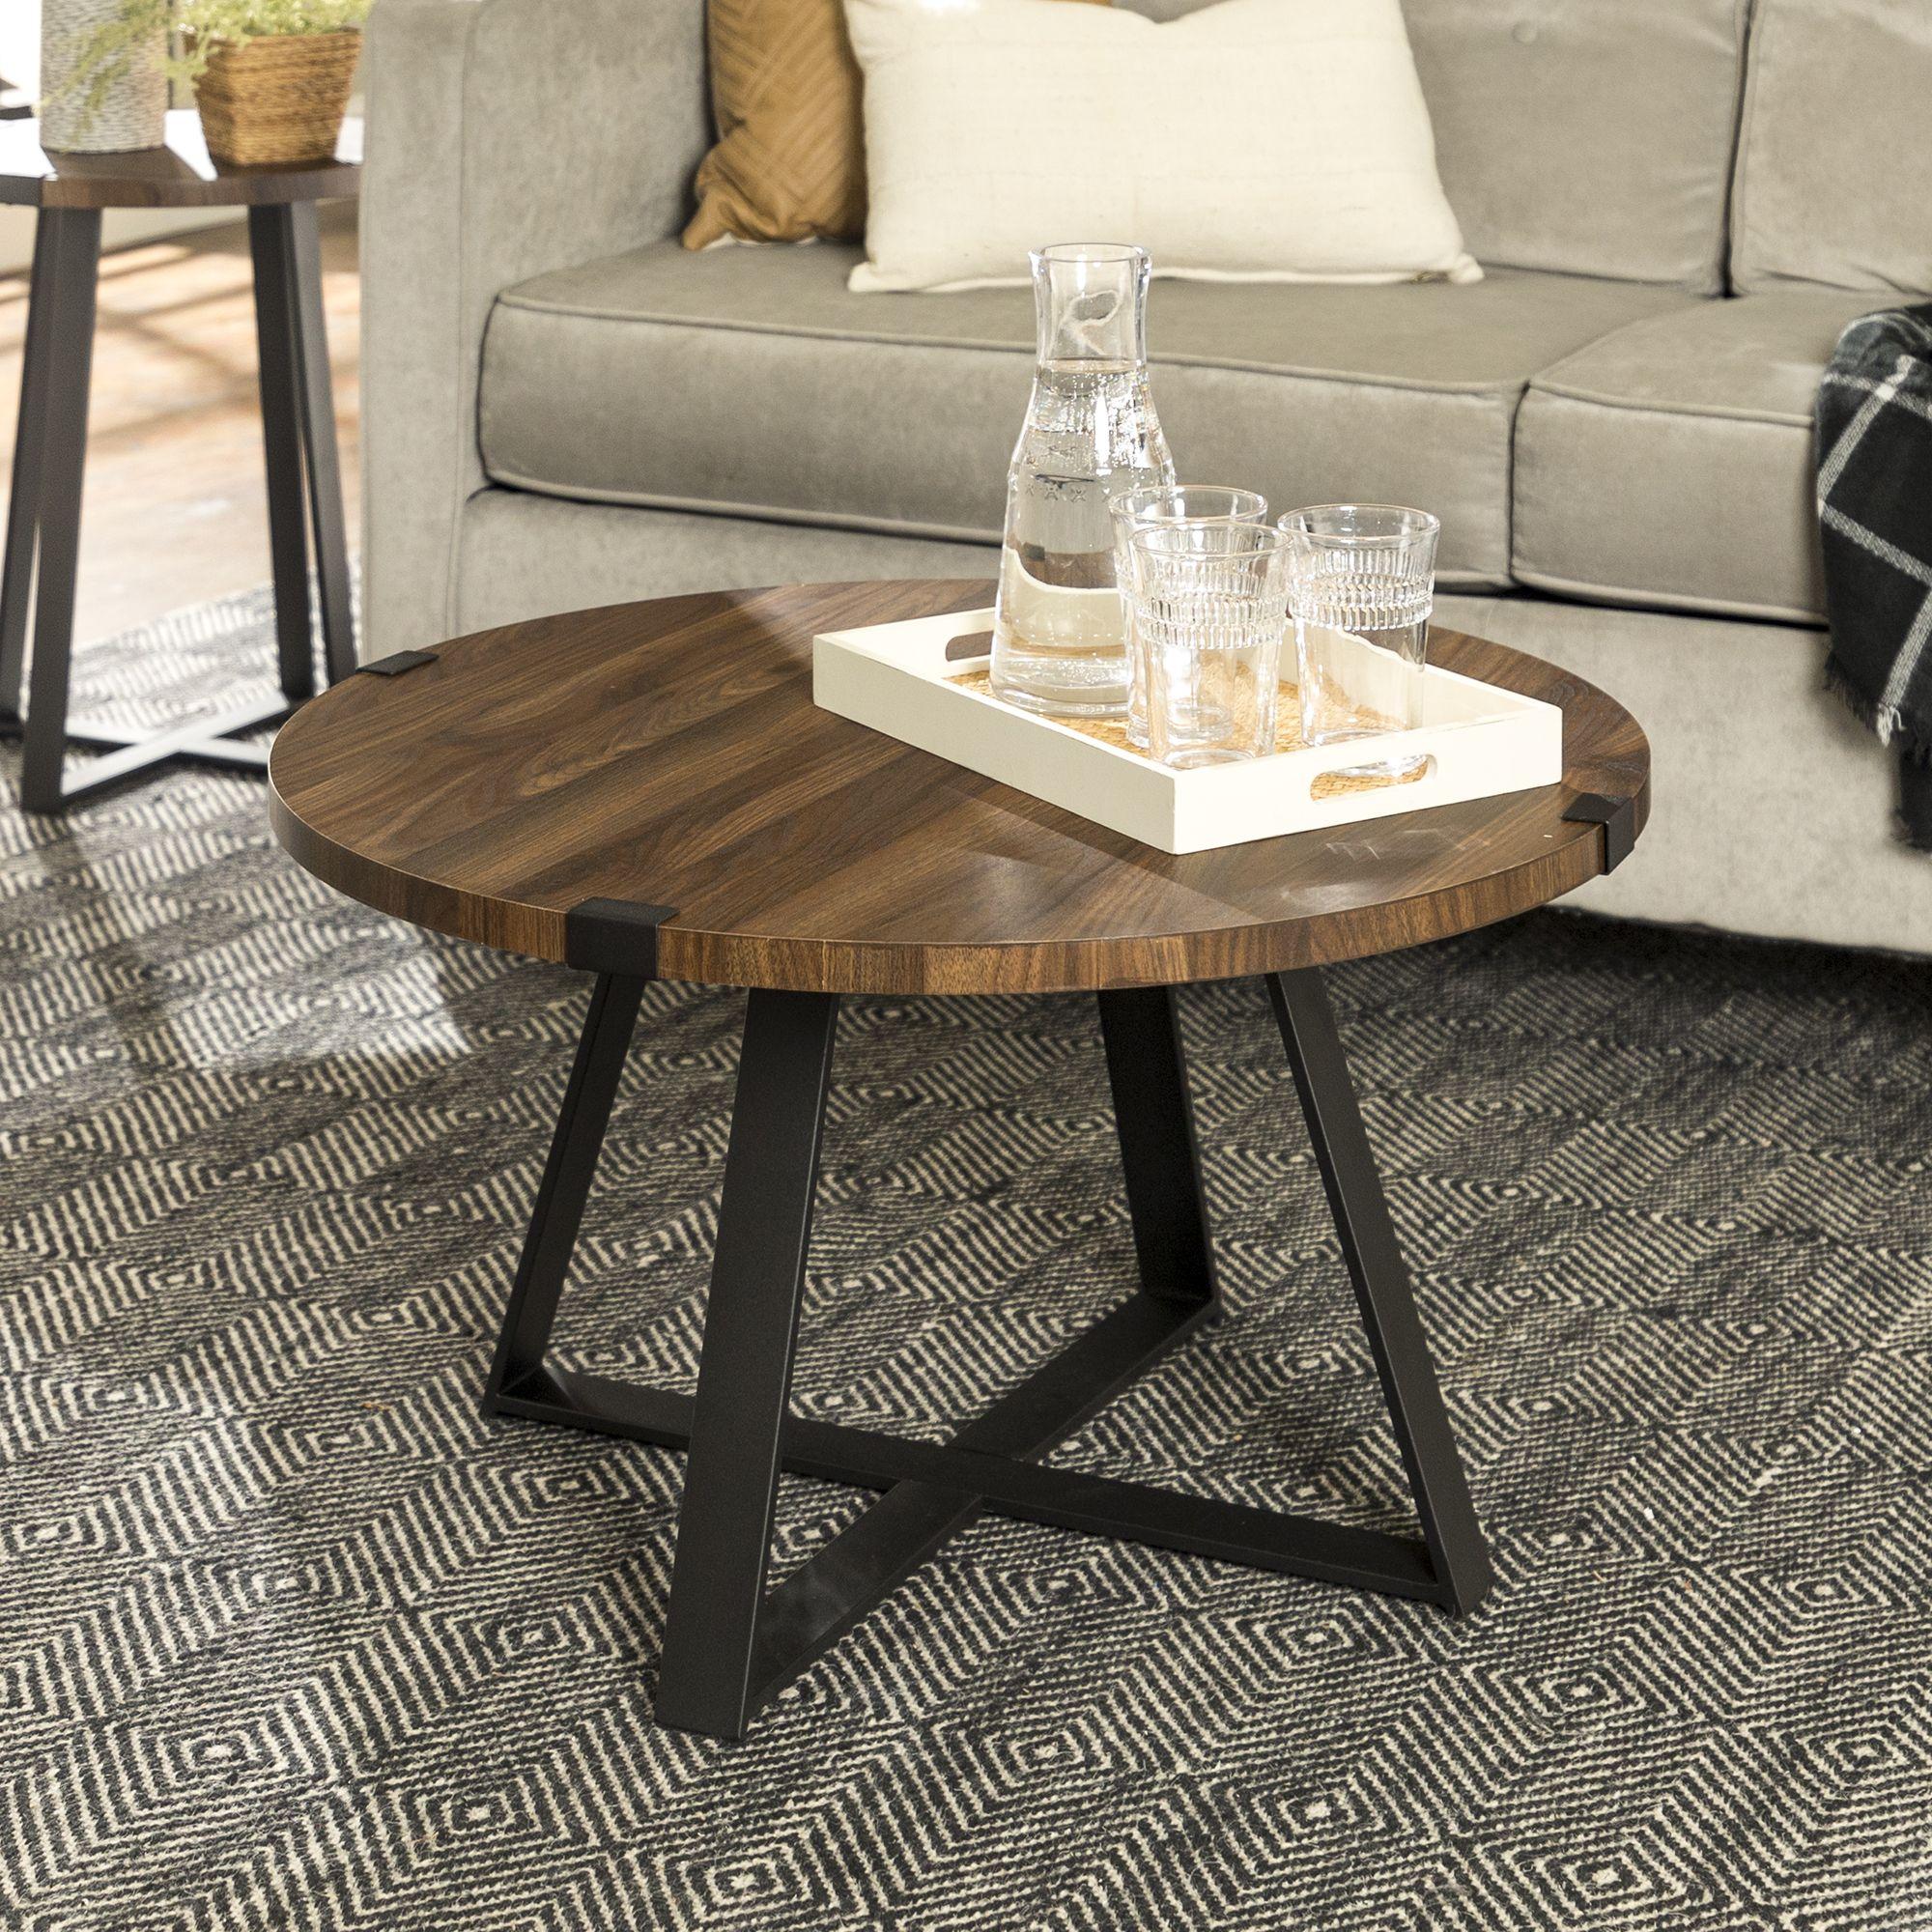 Slate Wrap Leg Dark Walnut Coffee Table By River Street Designs Walmart Com Round Wood Coffee Table Coffee Table Wood Living Room Coffee Table [ 2000 x 2000 Pixel ]